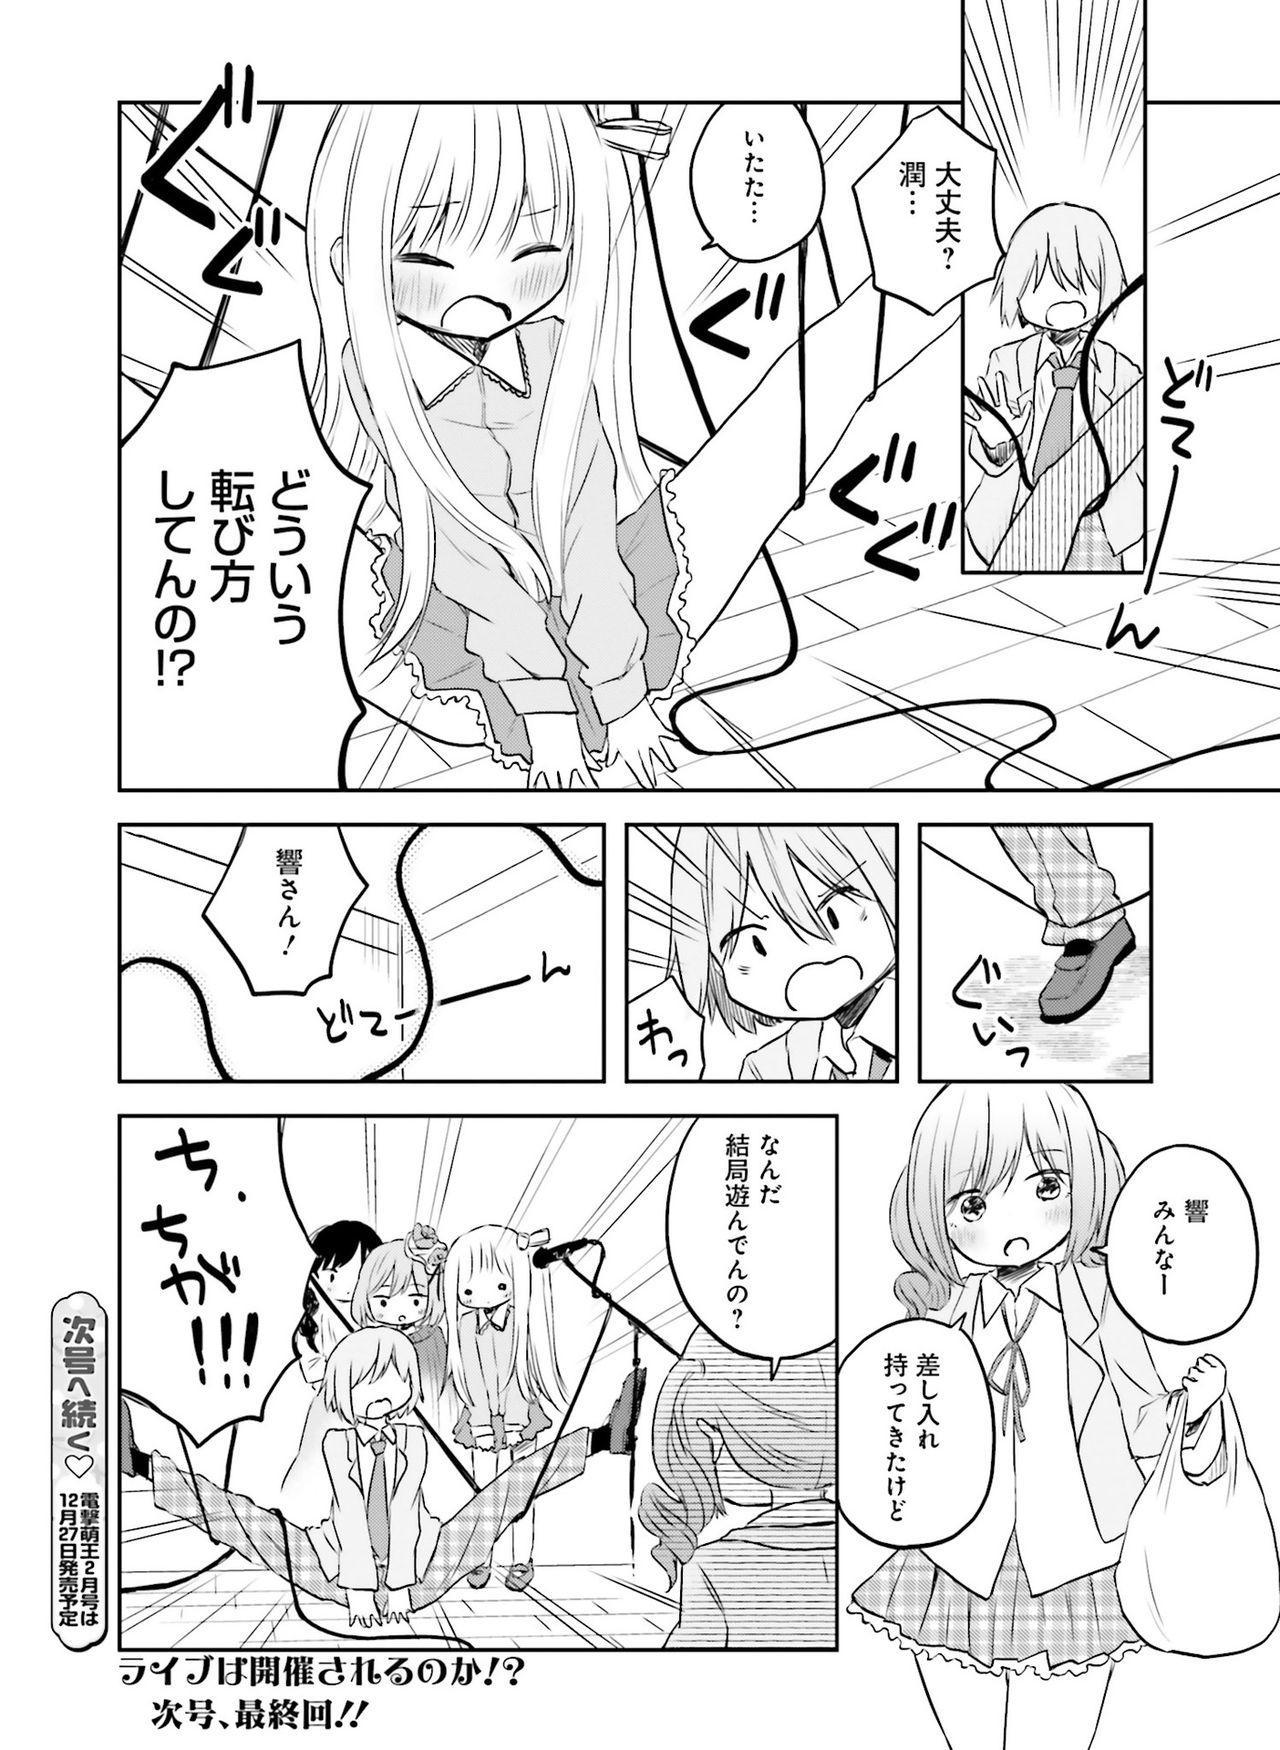 Dengeki Moeoh 2016-12 70